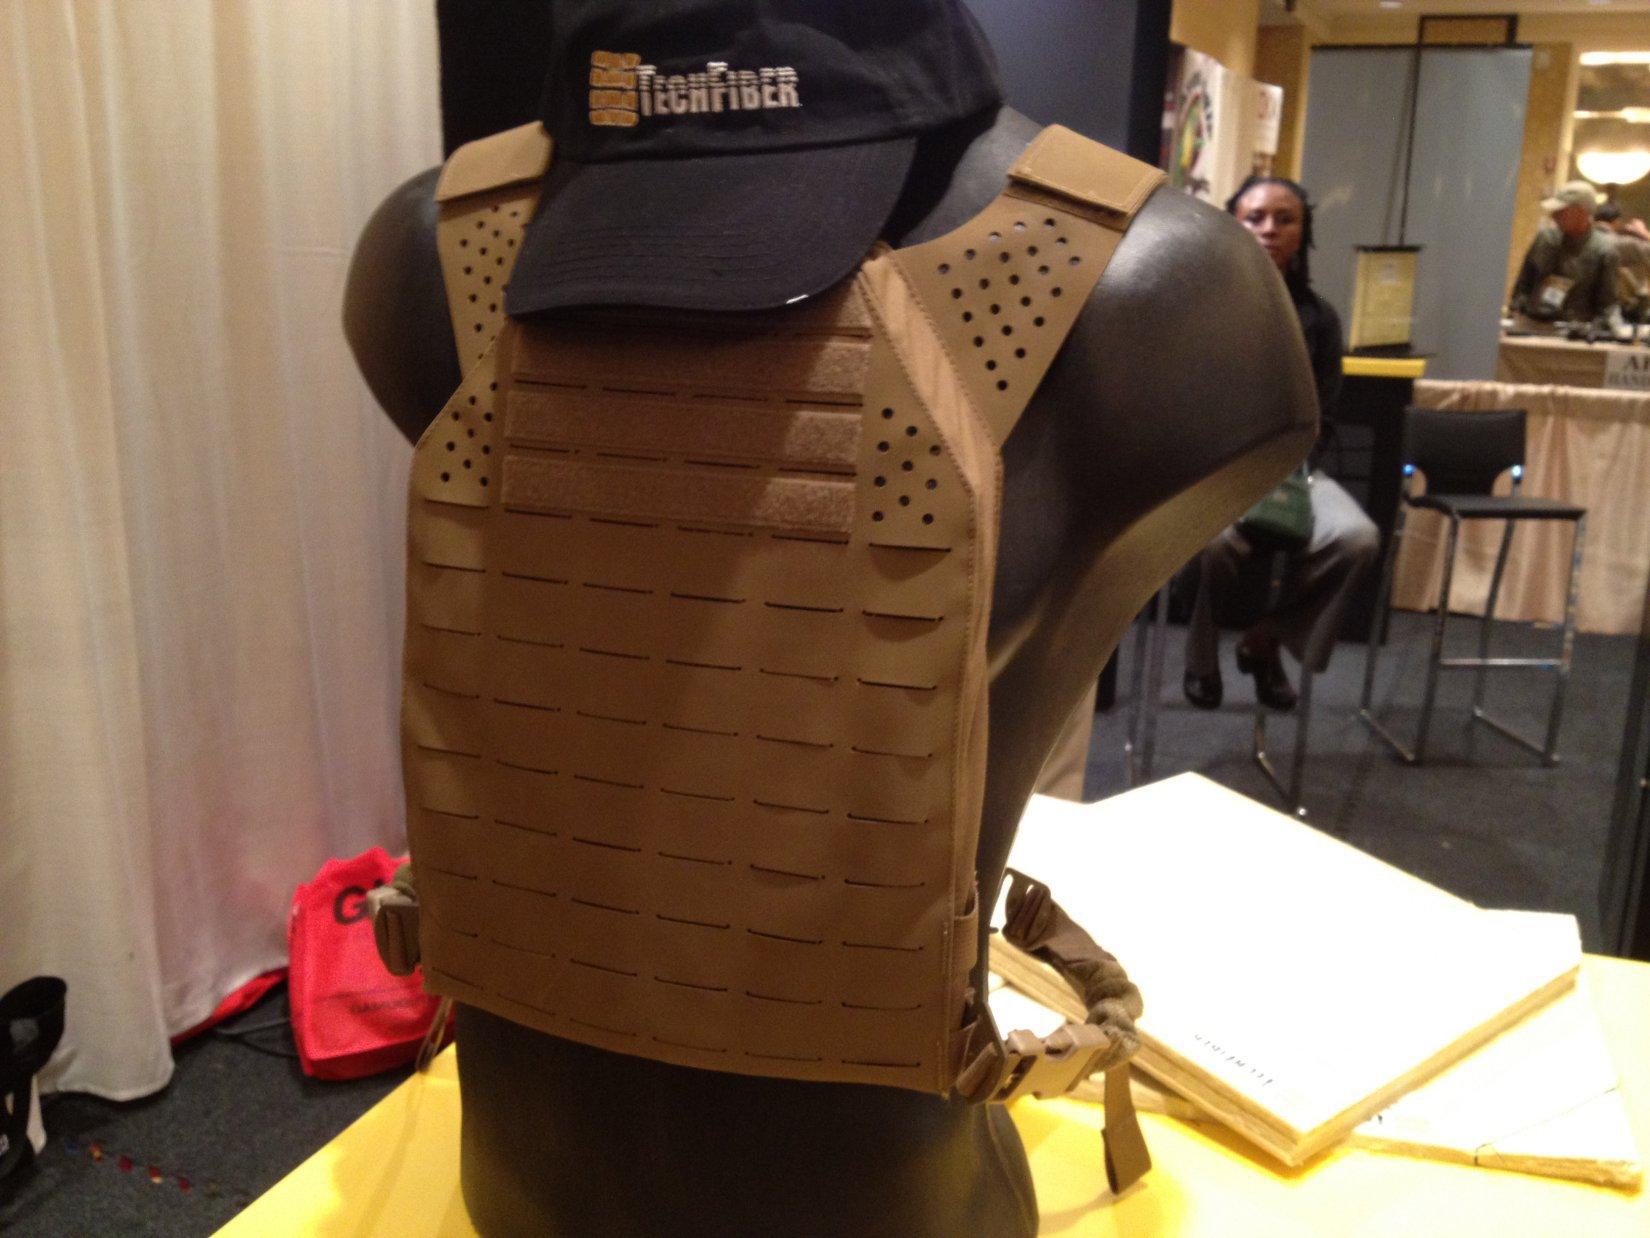 TechFiber T-Flex SH/SA Unidirectional Ballistic Fabric with Teijin Aramid Twaron or DuPont Kevlar Aramid Fiber for Tactical Armor Carriers/Body Armor (Soft Armor Panels and Hard Armor Plates) and Vehicle Armor (Video!)